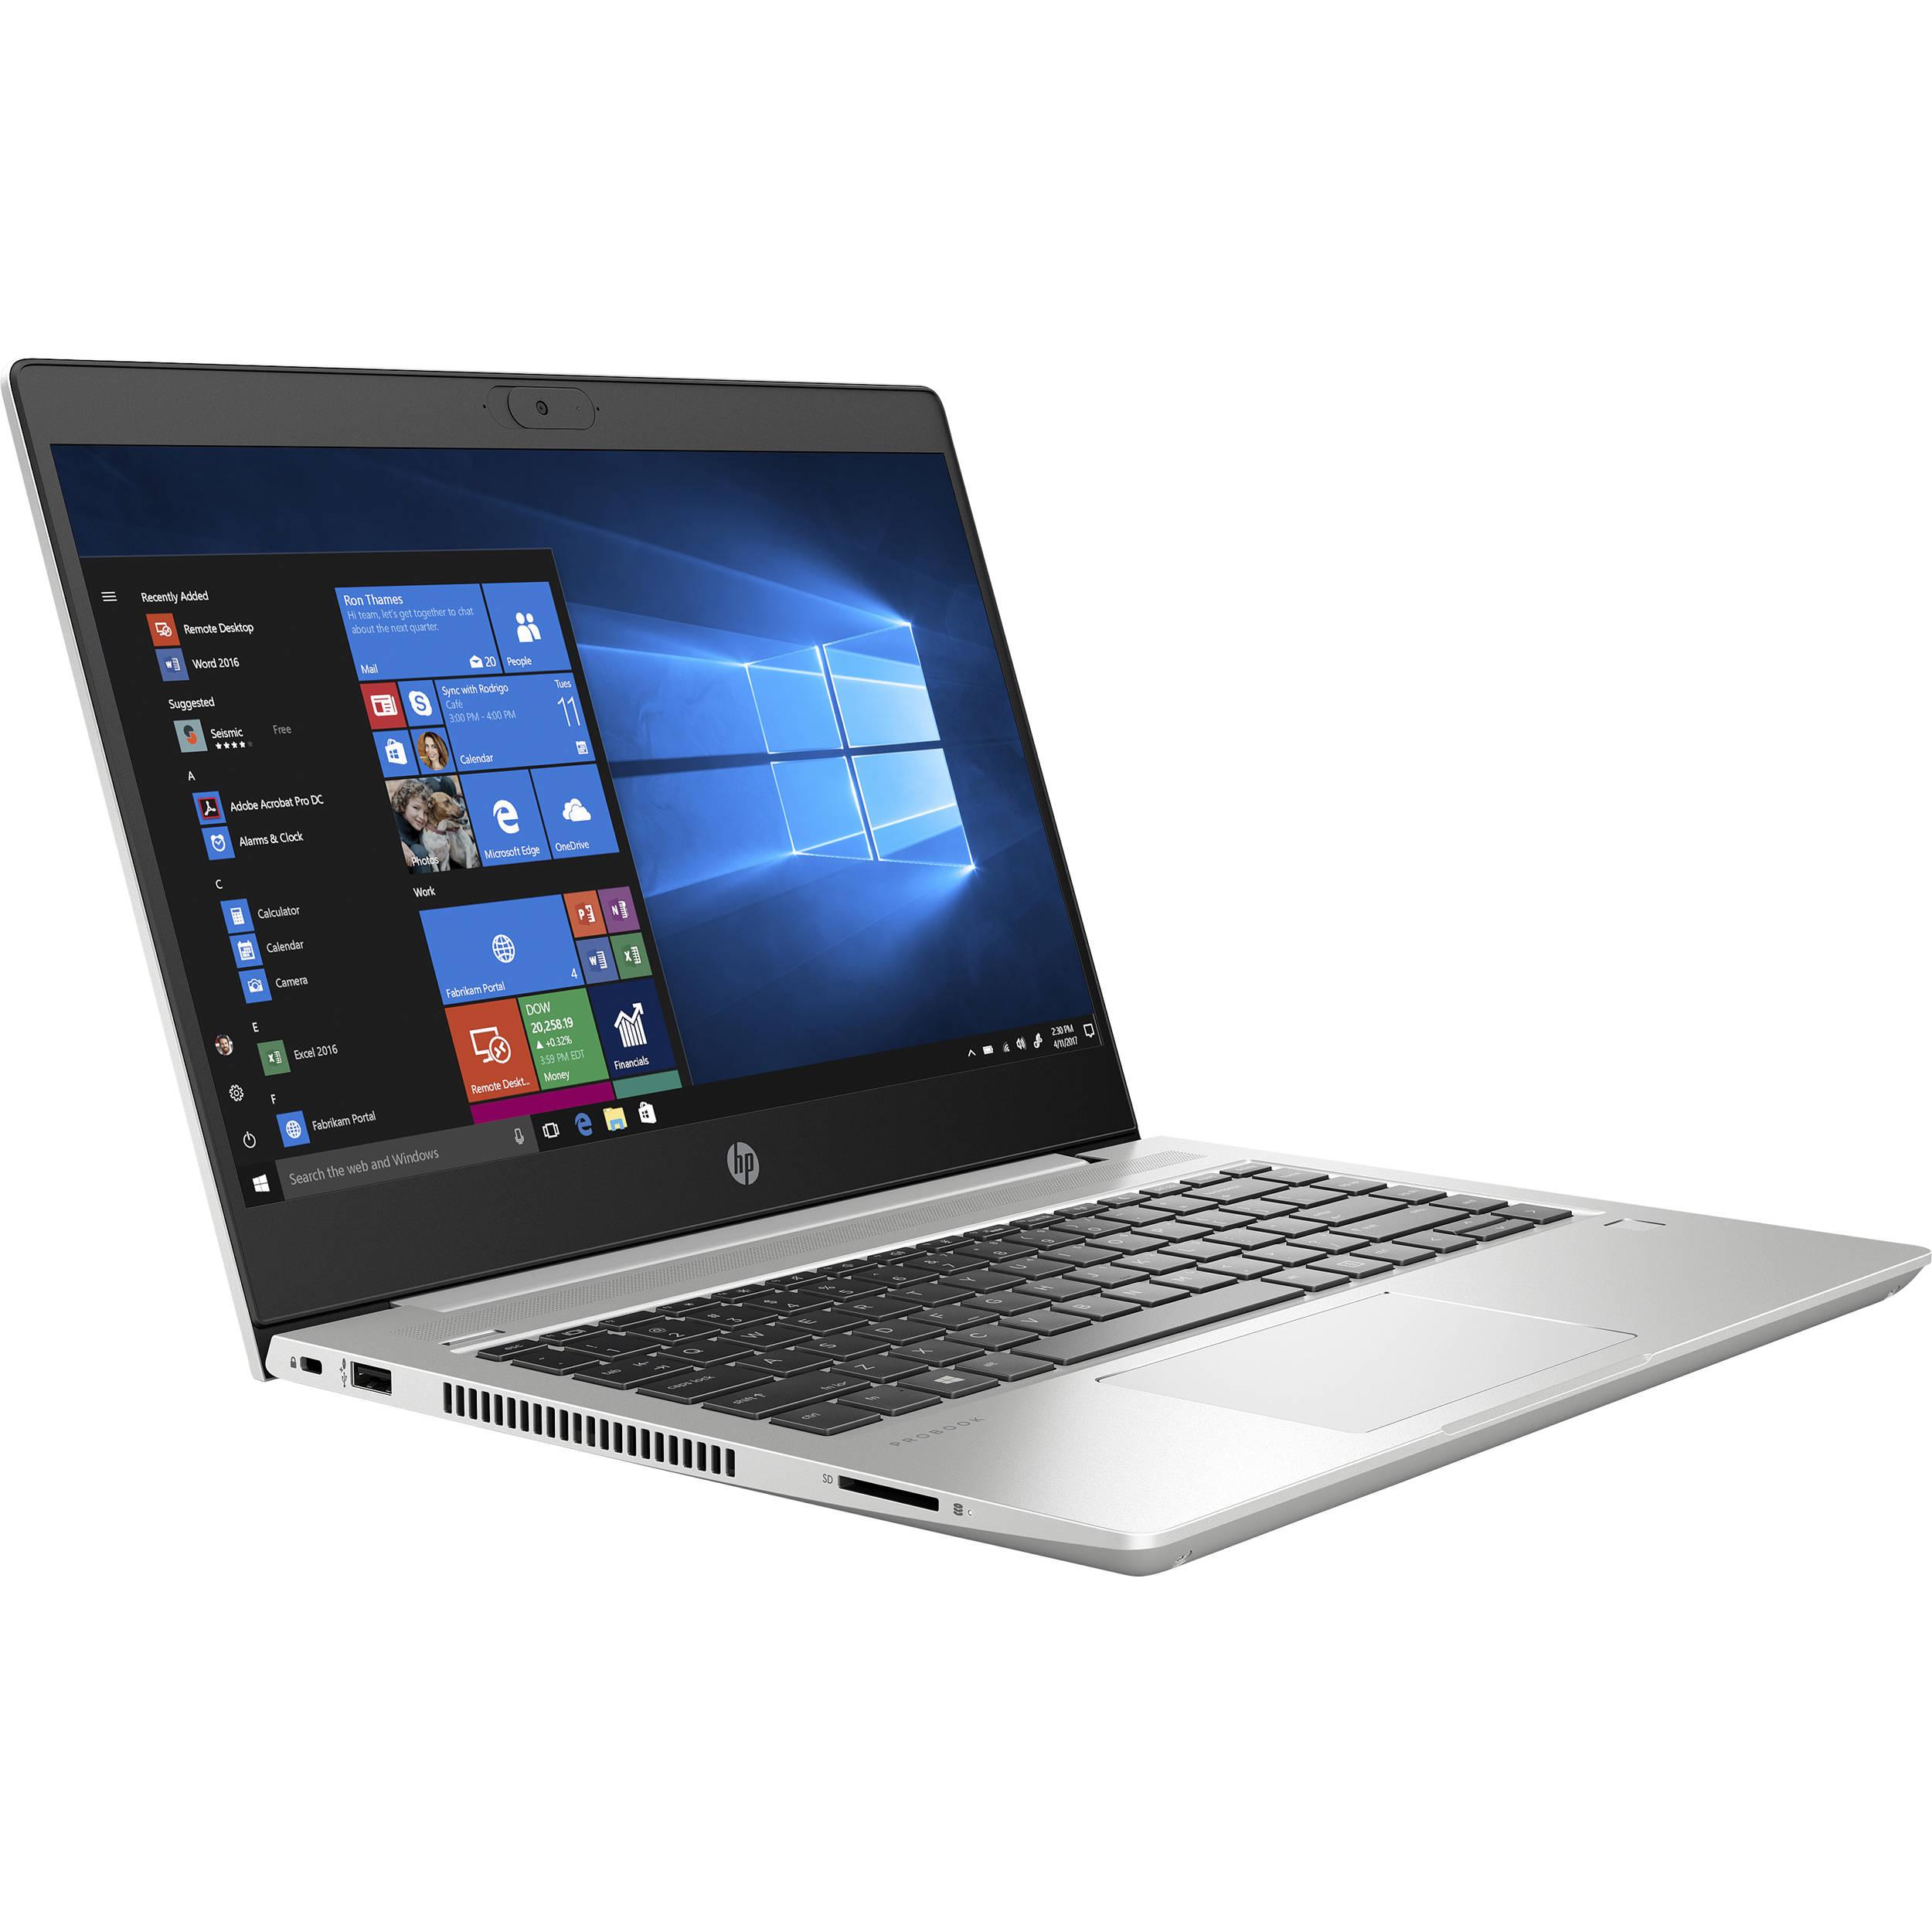 Hp 14 Probook 440 G7 Multi Touch Laptop 8we42ut Aba